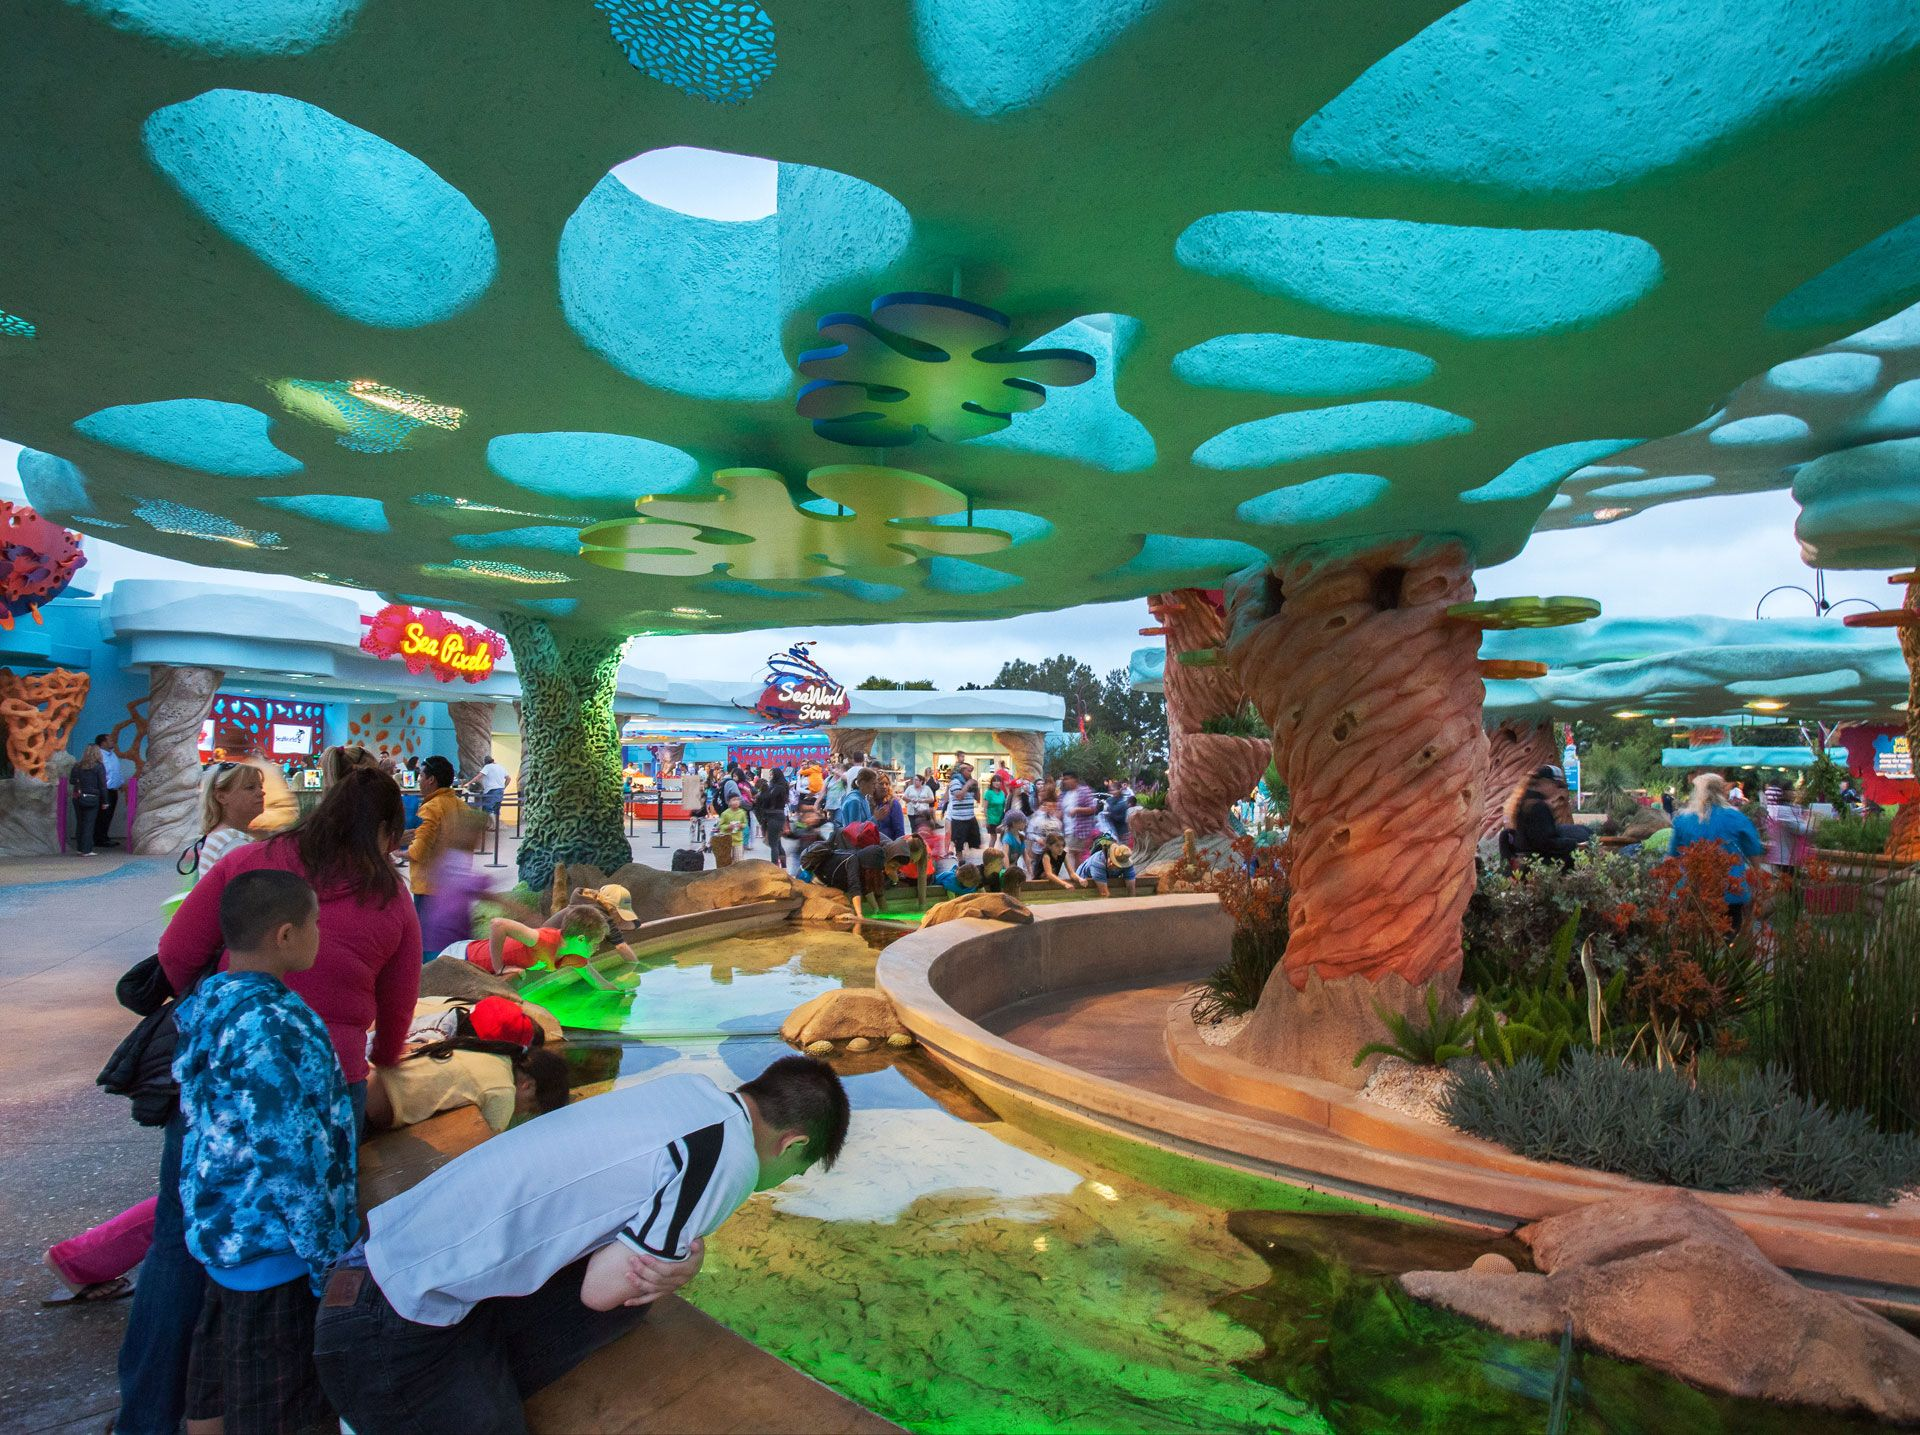 Explorer S Reef Seaworld San Diego California Usa By Pgav Destinations Sea World Seaworld San Diego Welk Resort